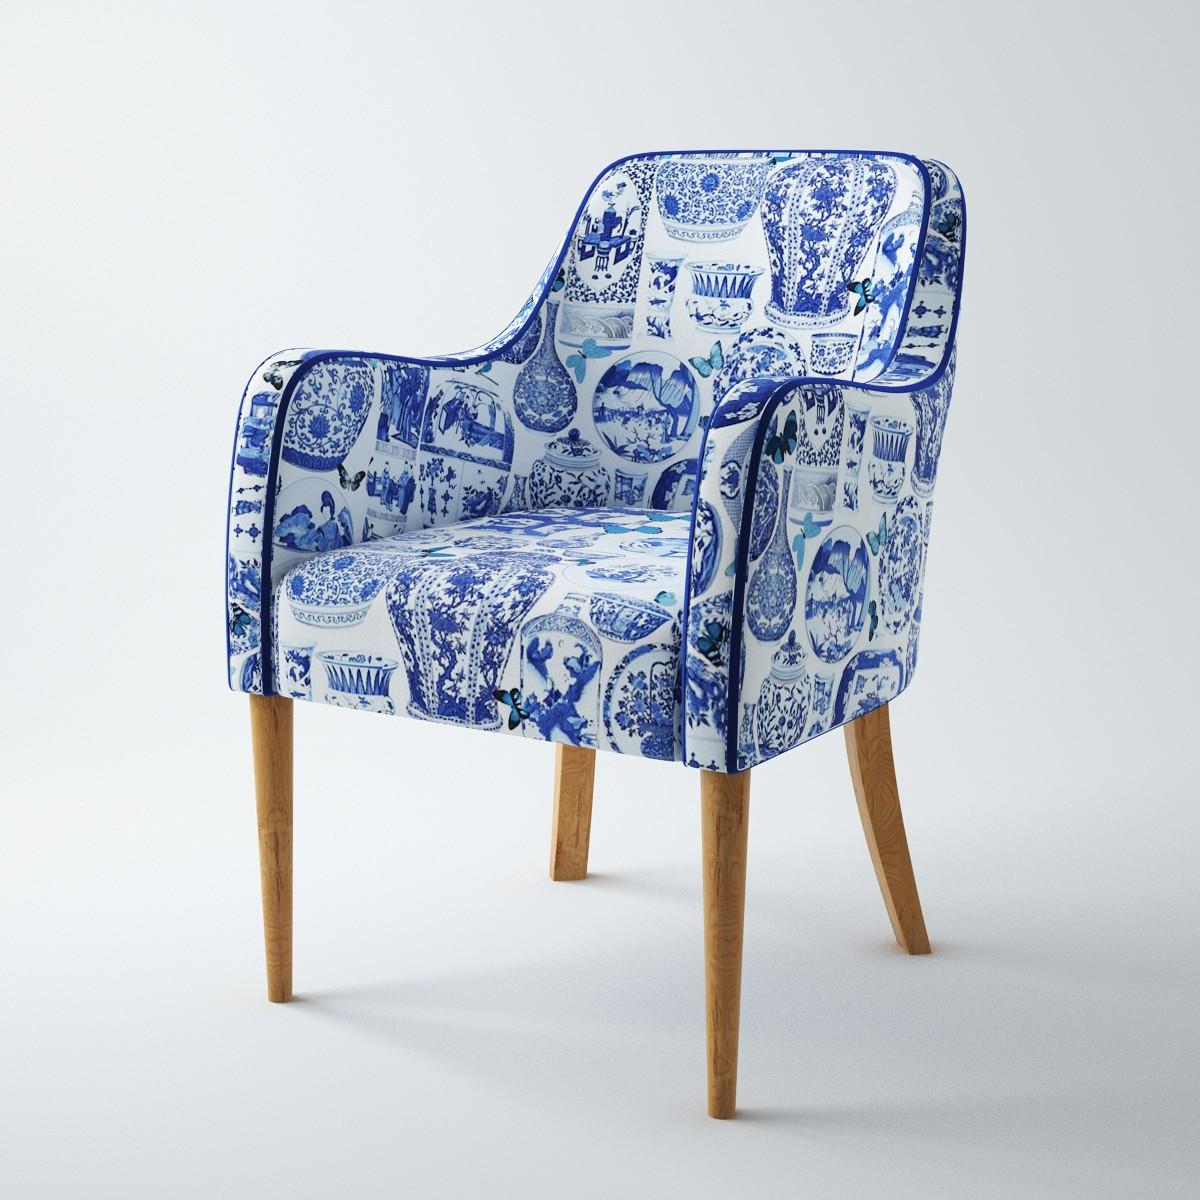 Genny 2 horeca stoelen p m furniture horeca meubilair for Horeca stoelen